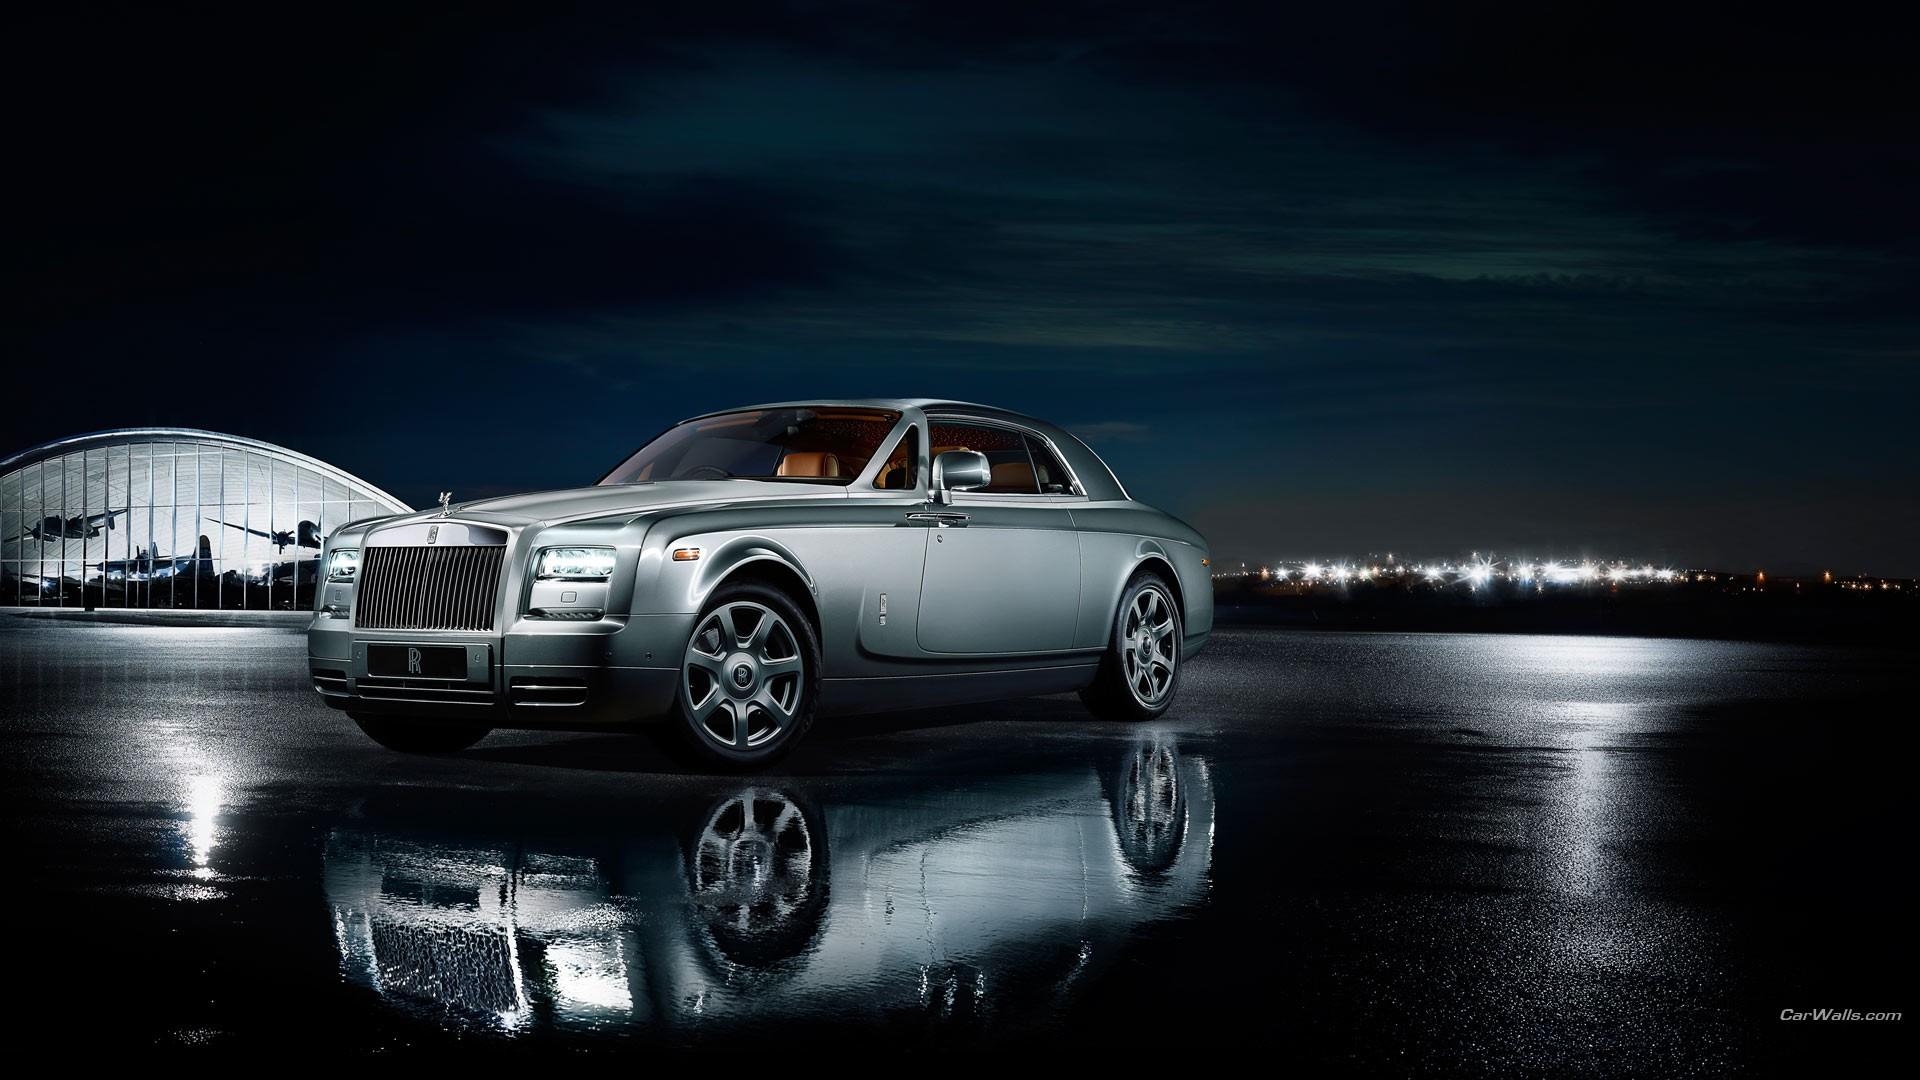 Wallpaper 1920x1080 Px Car Rolls Royce Phantom 1920x1080